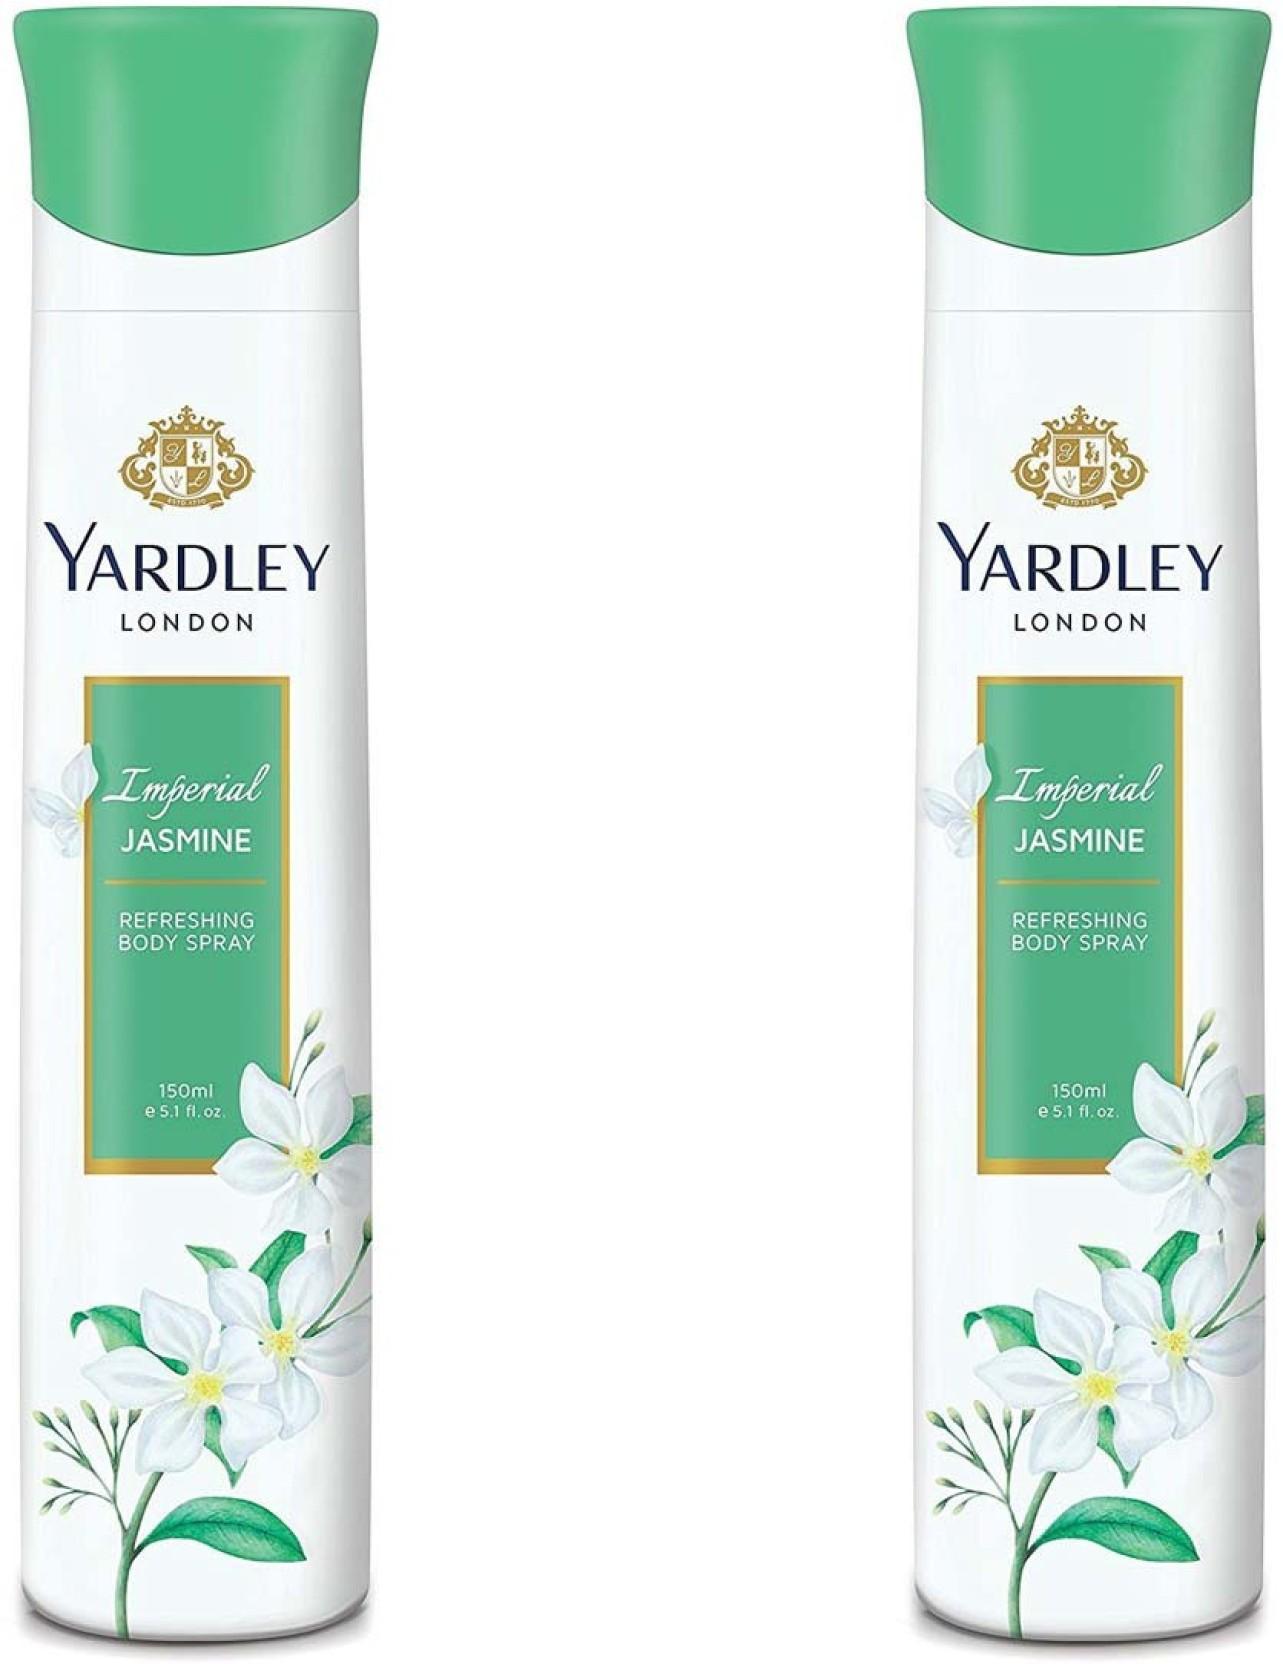 Yardley London Imperial Jasmine Perfumed Deo 150ml Body Mist For Enchanteur Eau De Cologne Romantic 120 Ml On Offer